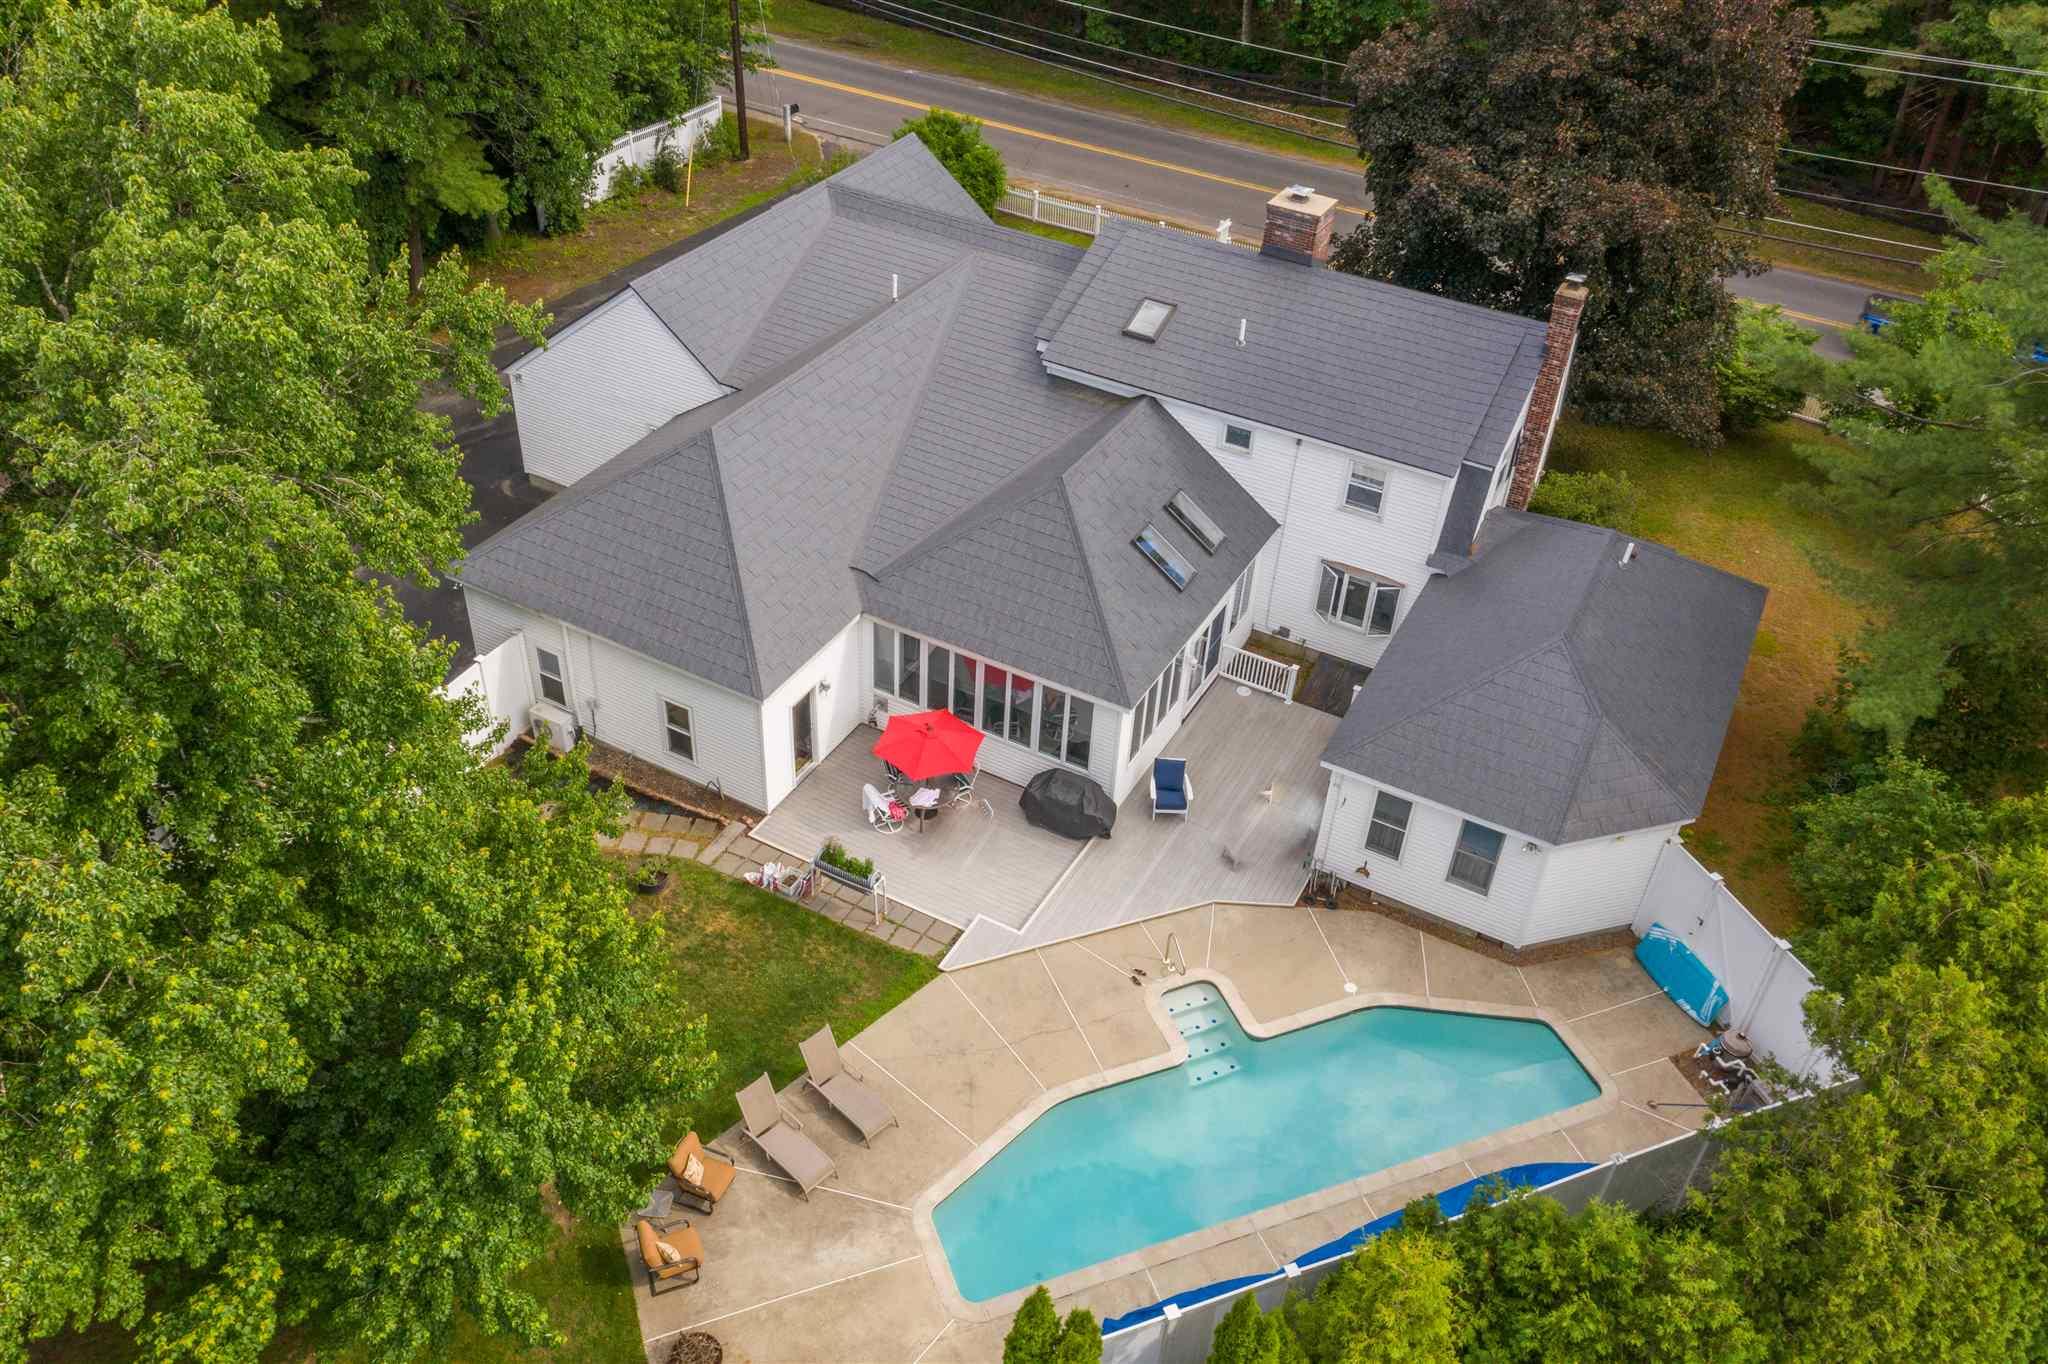 Merrimack - $549,900